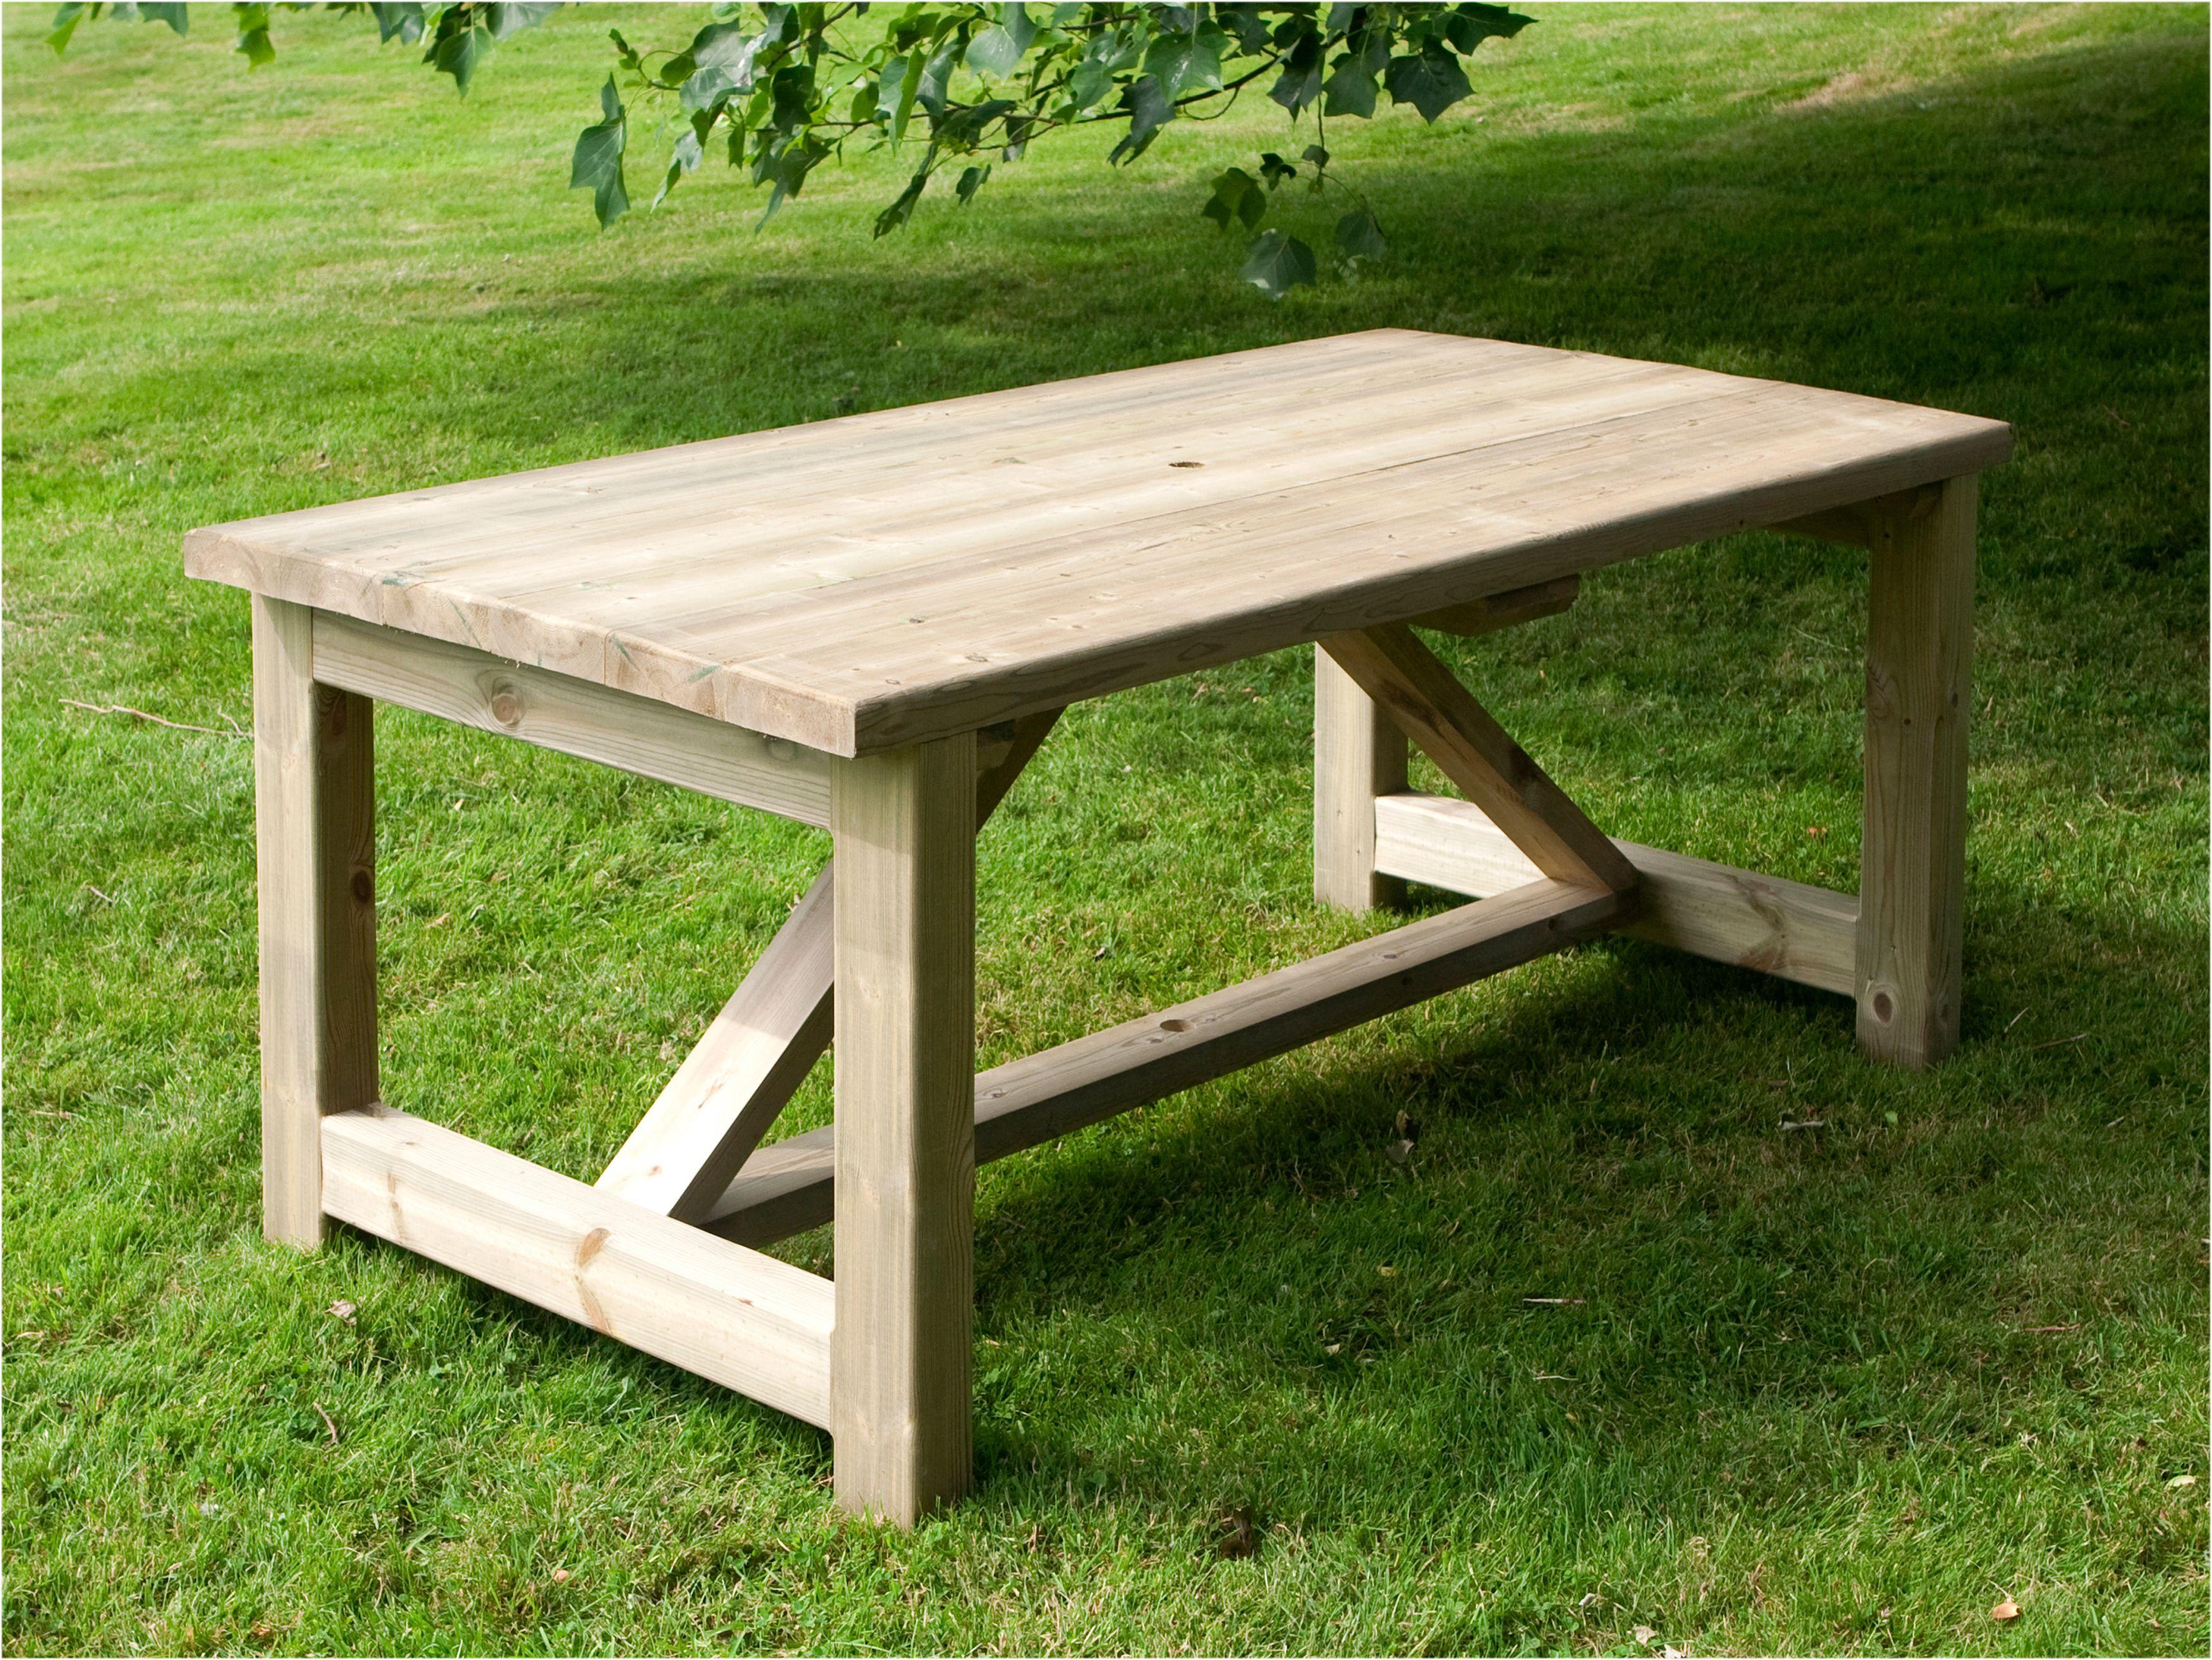 Rectangular Garden Table Green In 2020 Wooden Garden Table Wooden Garden Furniture Outdoor Chairs